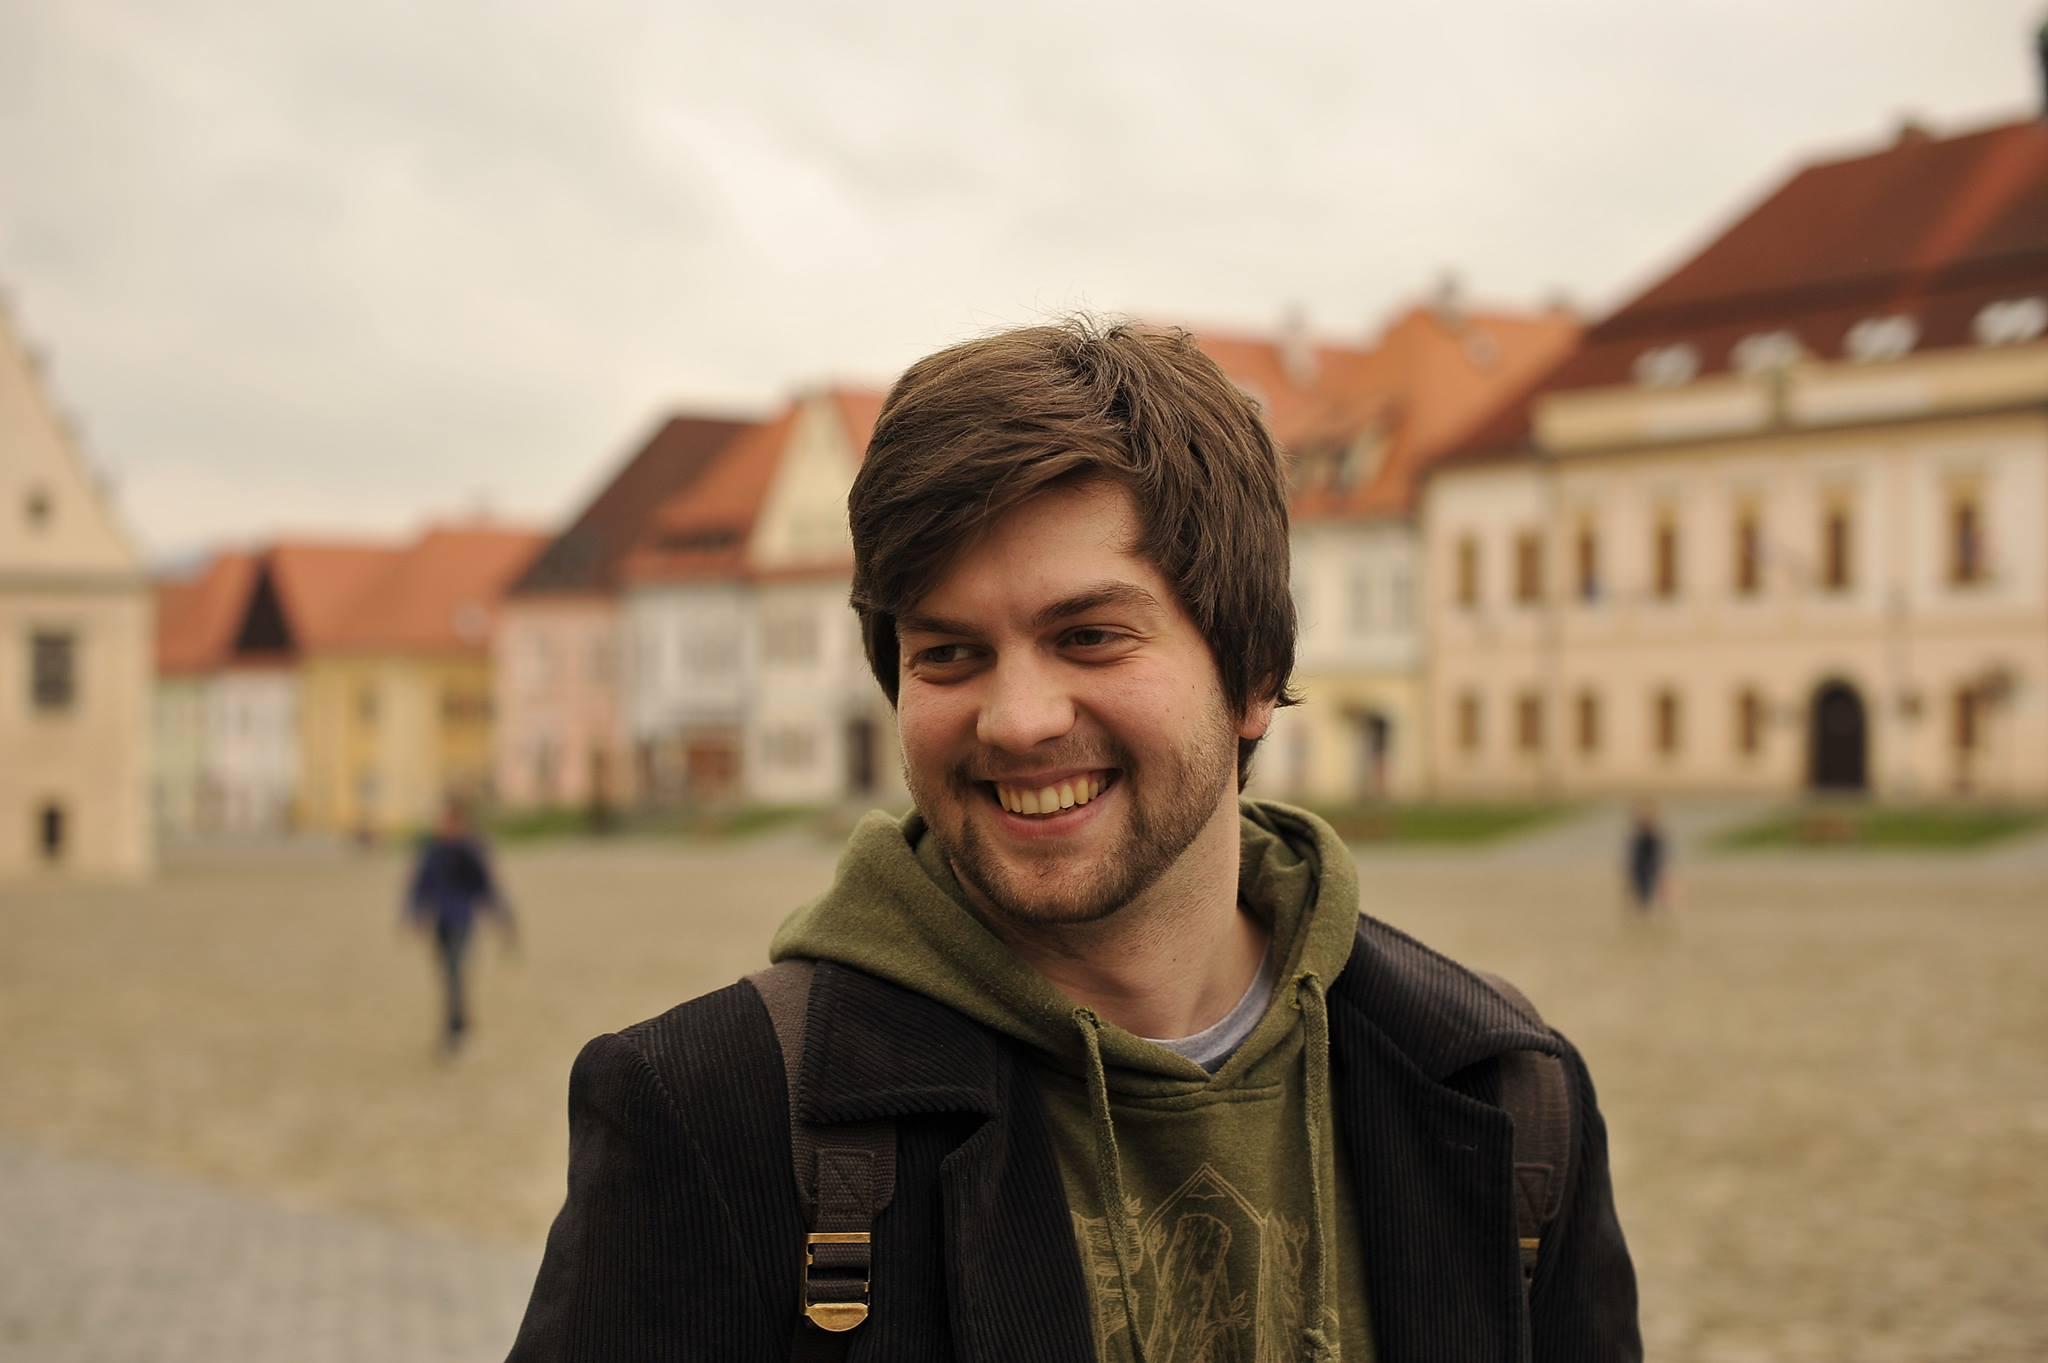 Daniel Viglaš